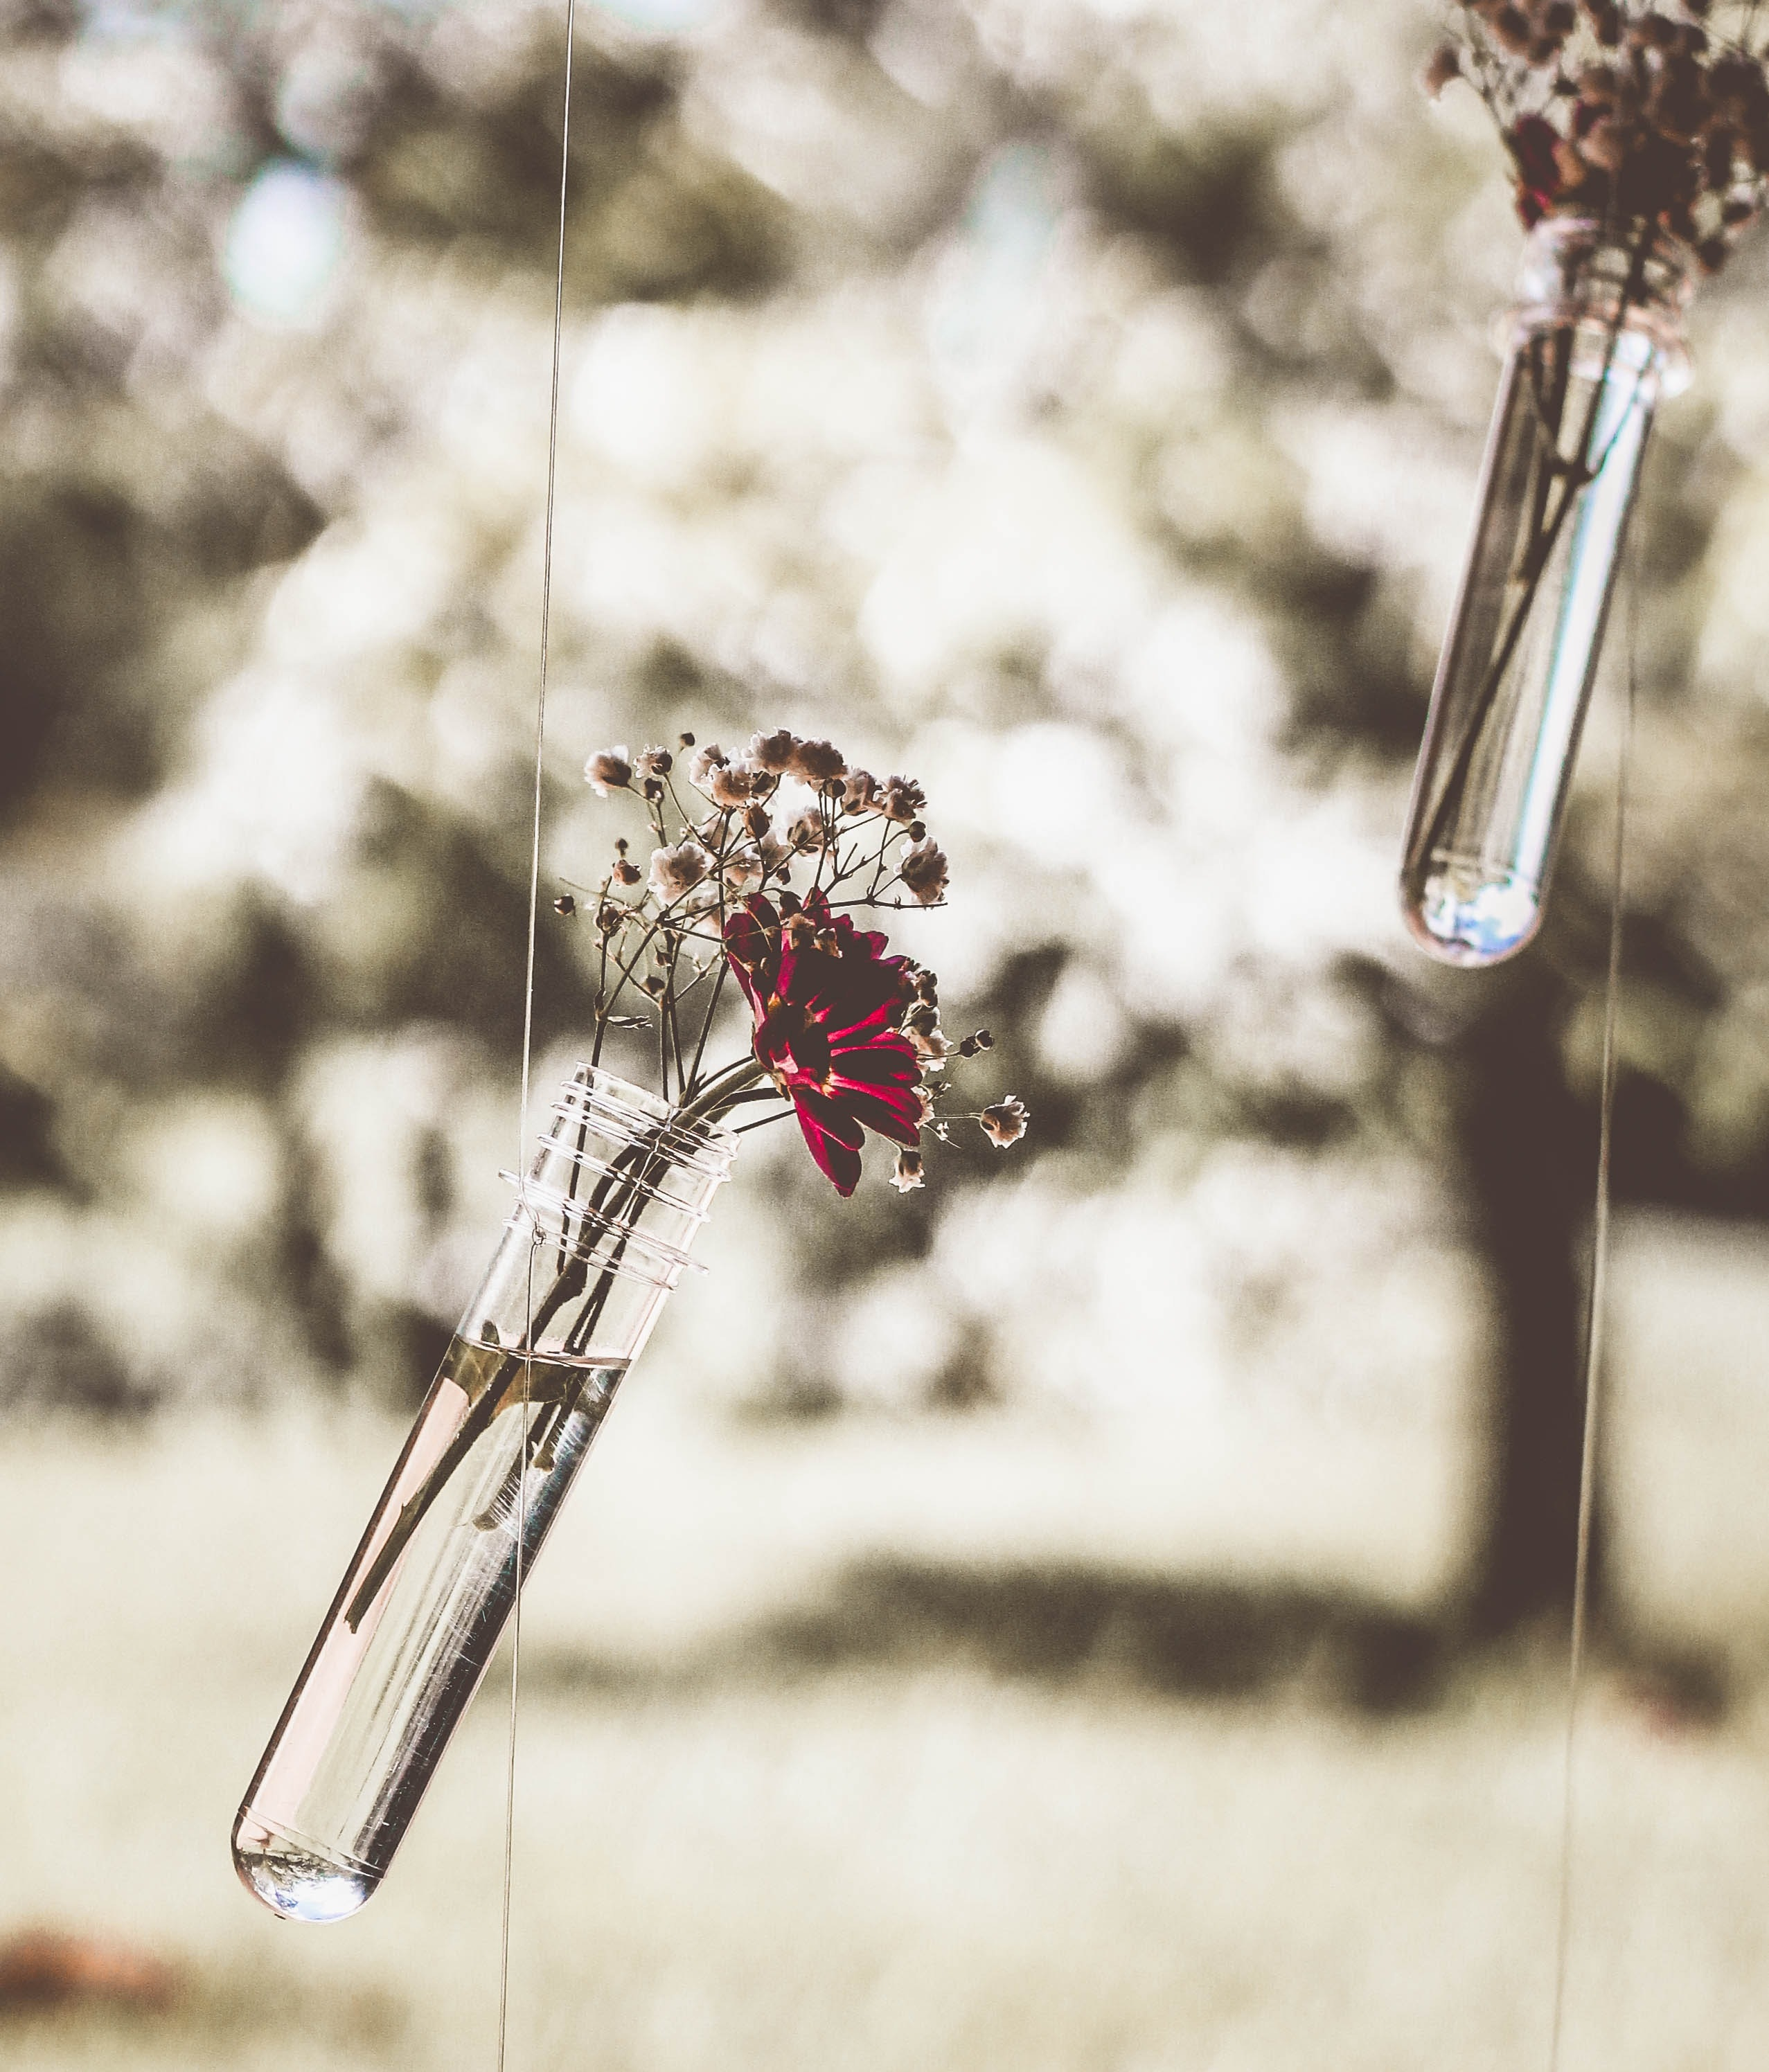 Hanging flower vase photo